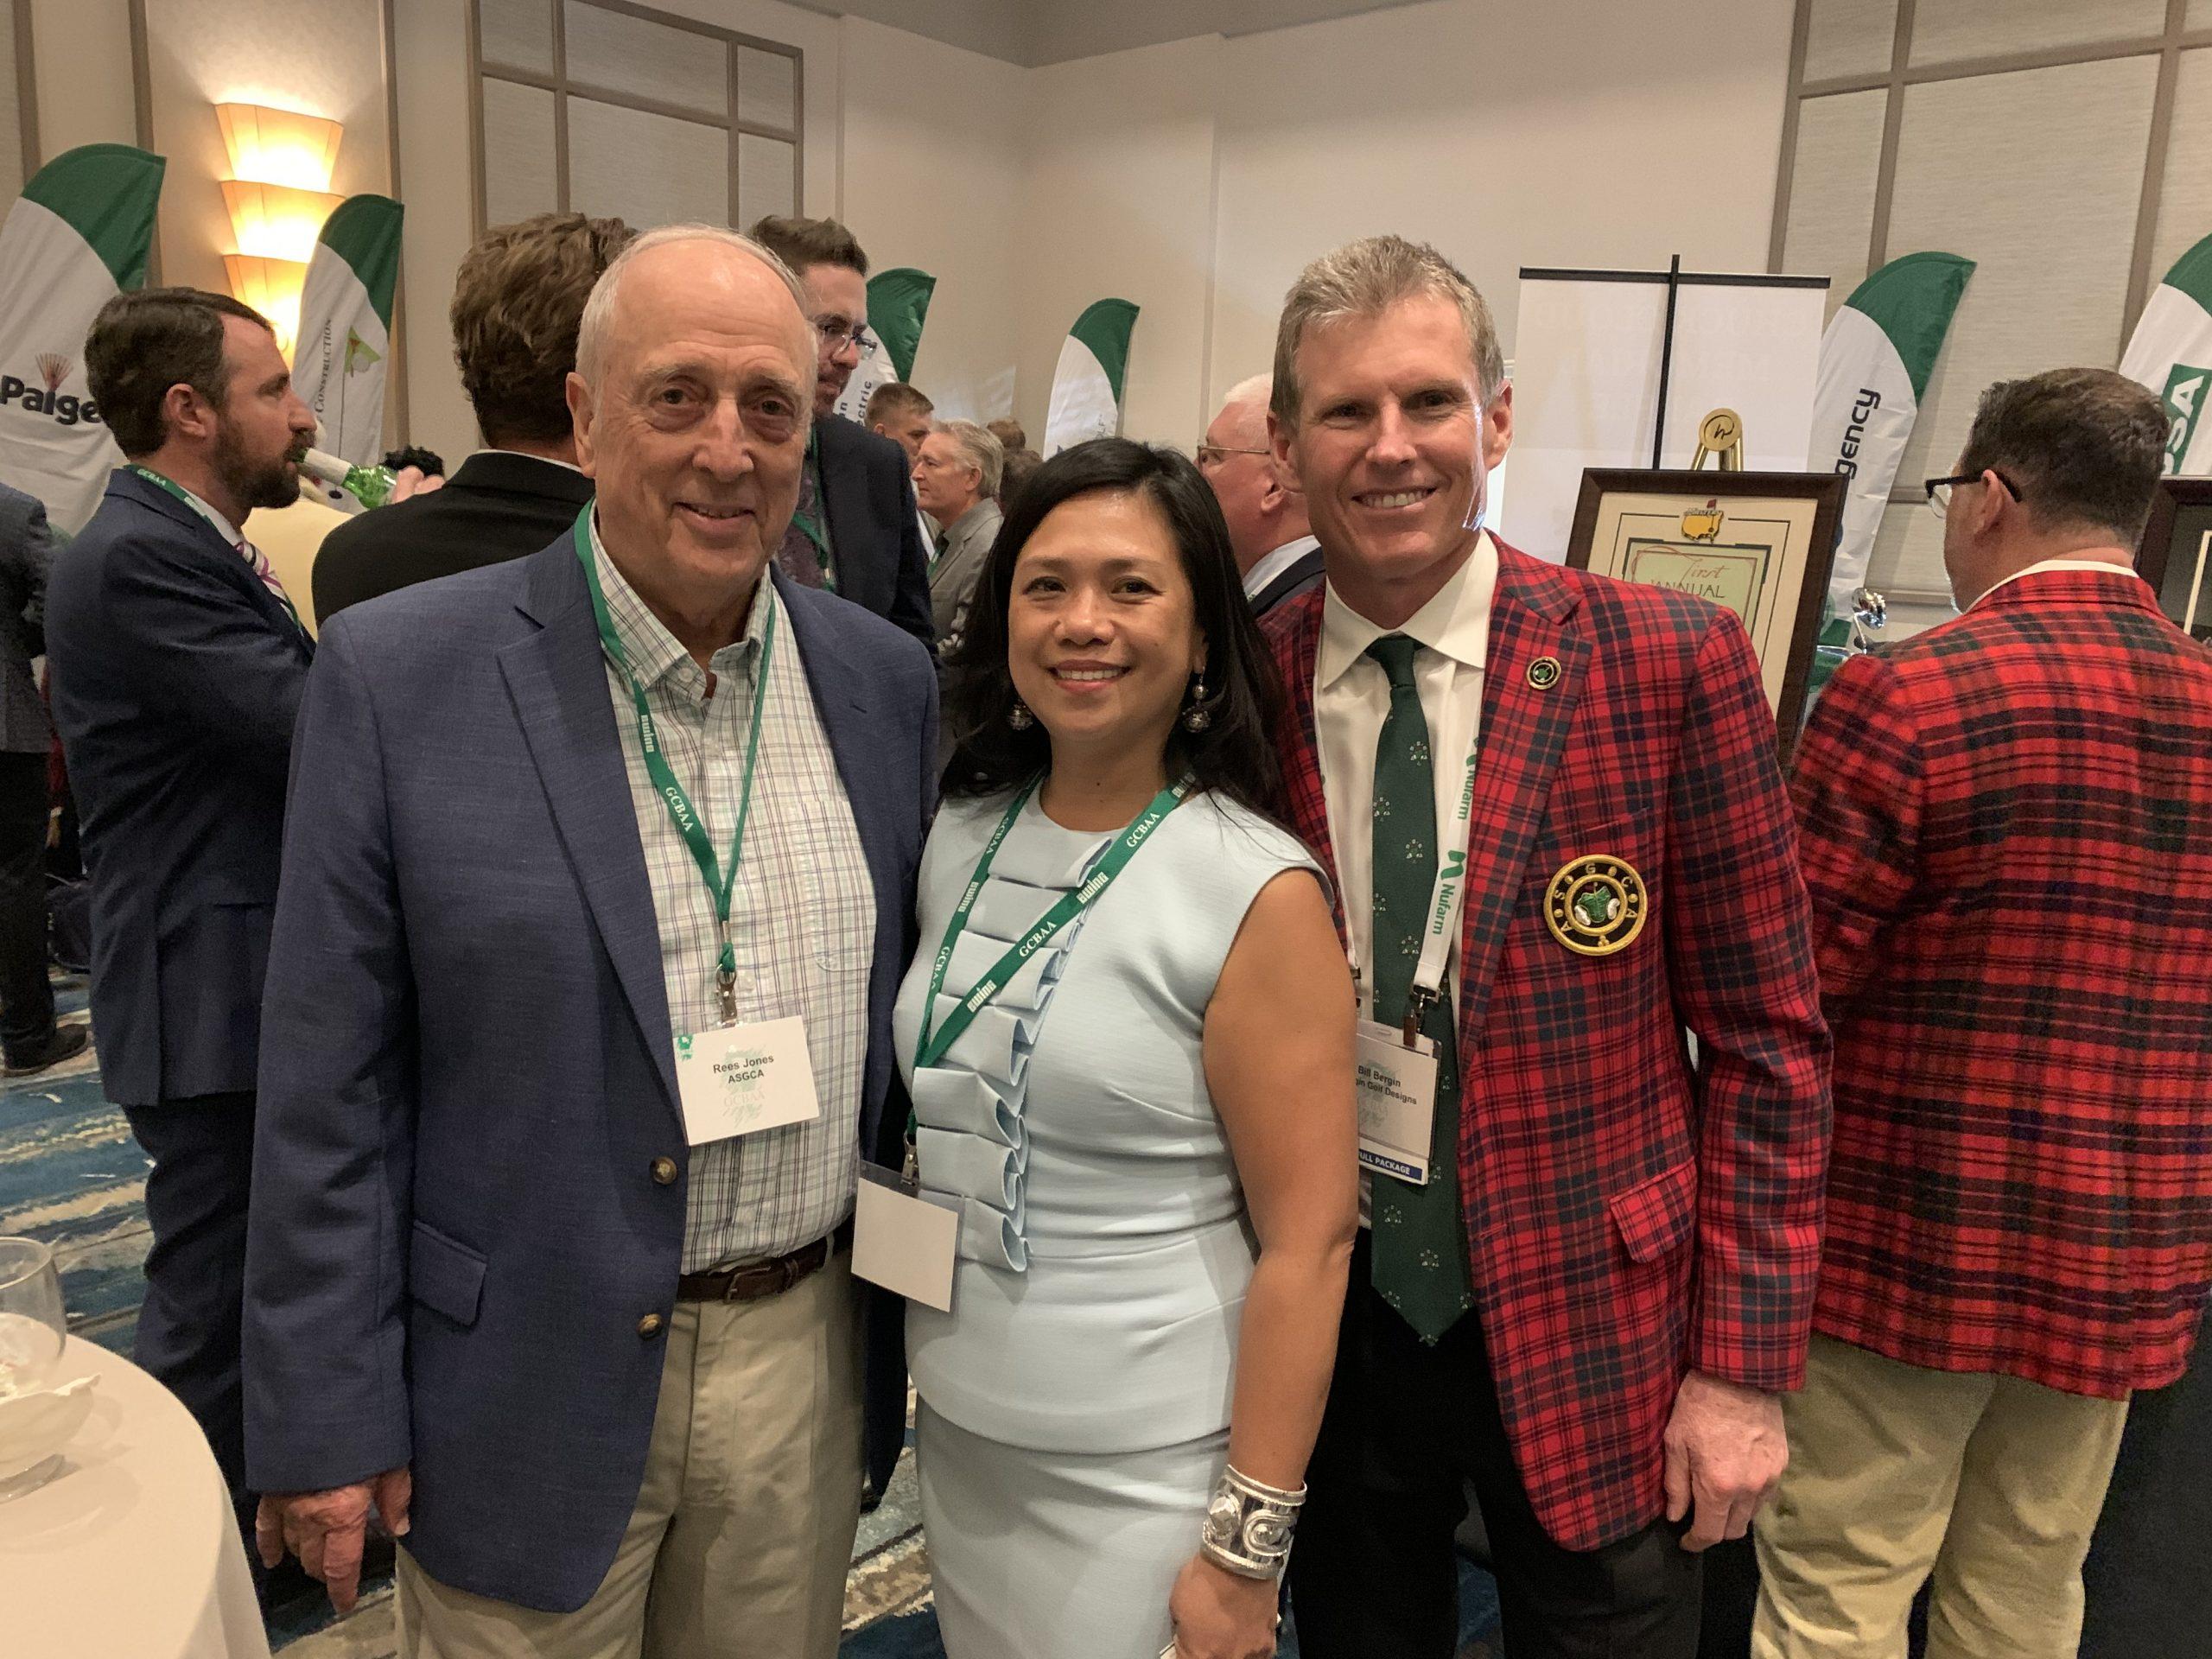 Ferrar at the Golf Industry Show 2020 in Orlando.